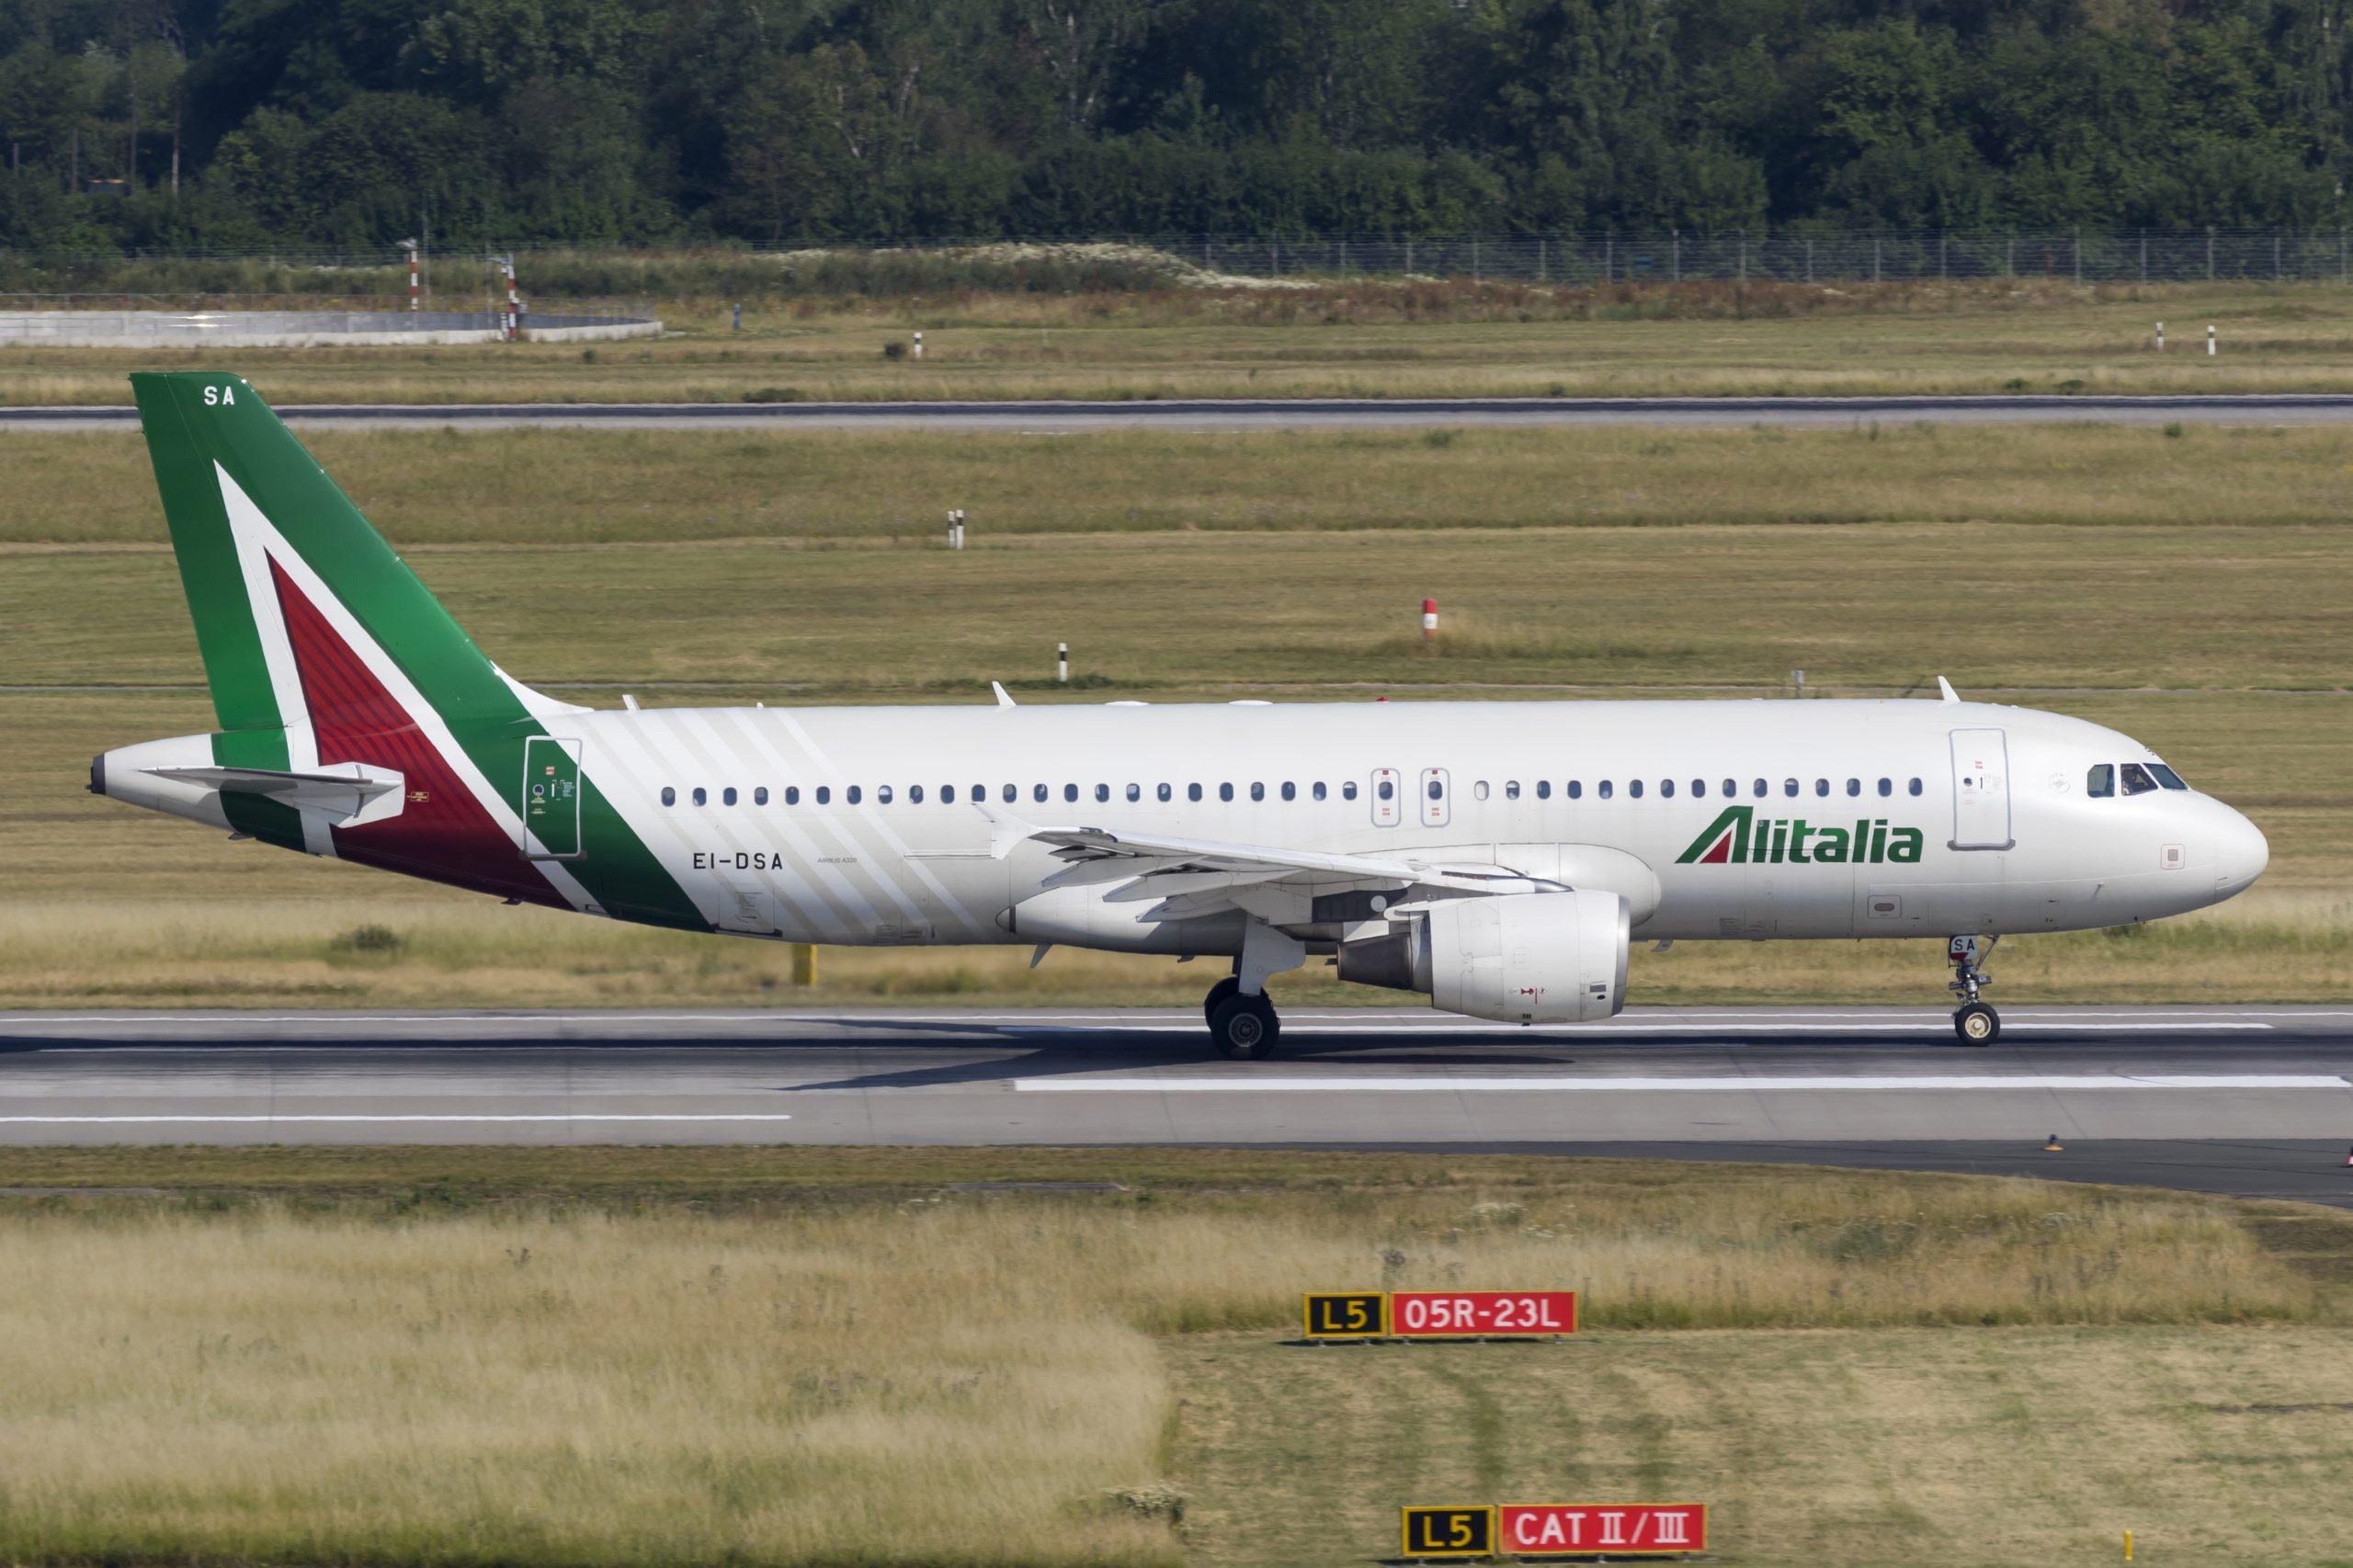 En Airbus A320-200 fra Alitalia. Foto: © Thorbjørn Brunander Sund, Danish Aviation Photo